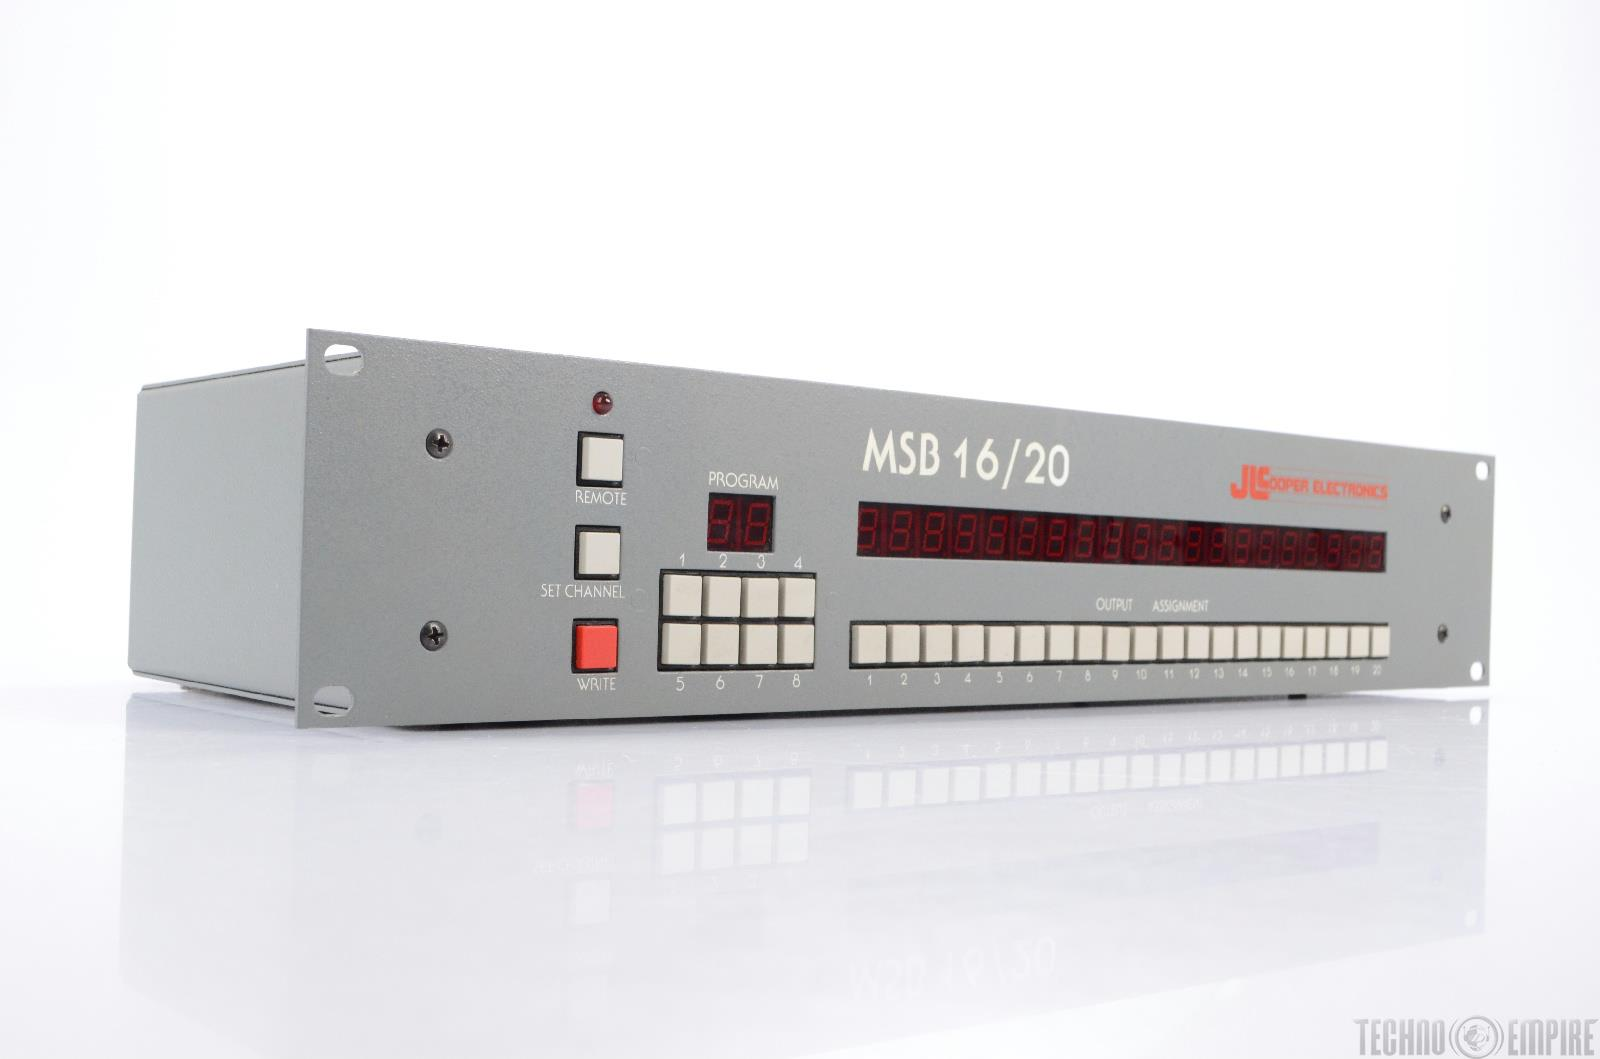 Jl Cooper Msb 16  20 Midi Patchbay Router  21130